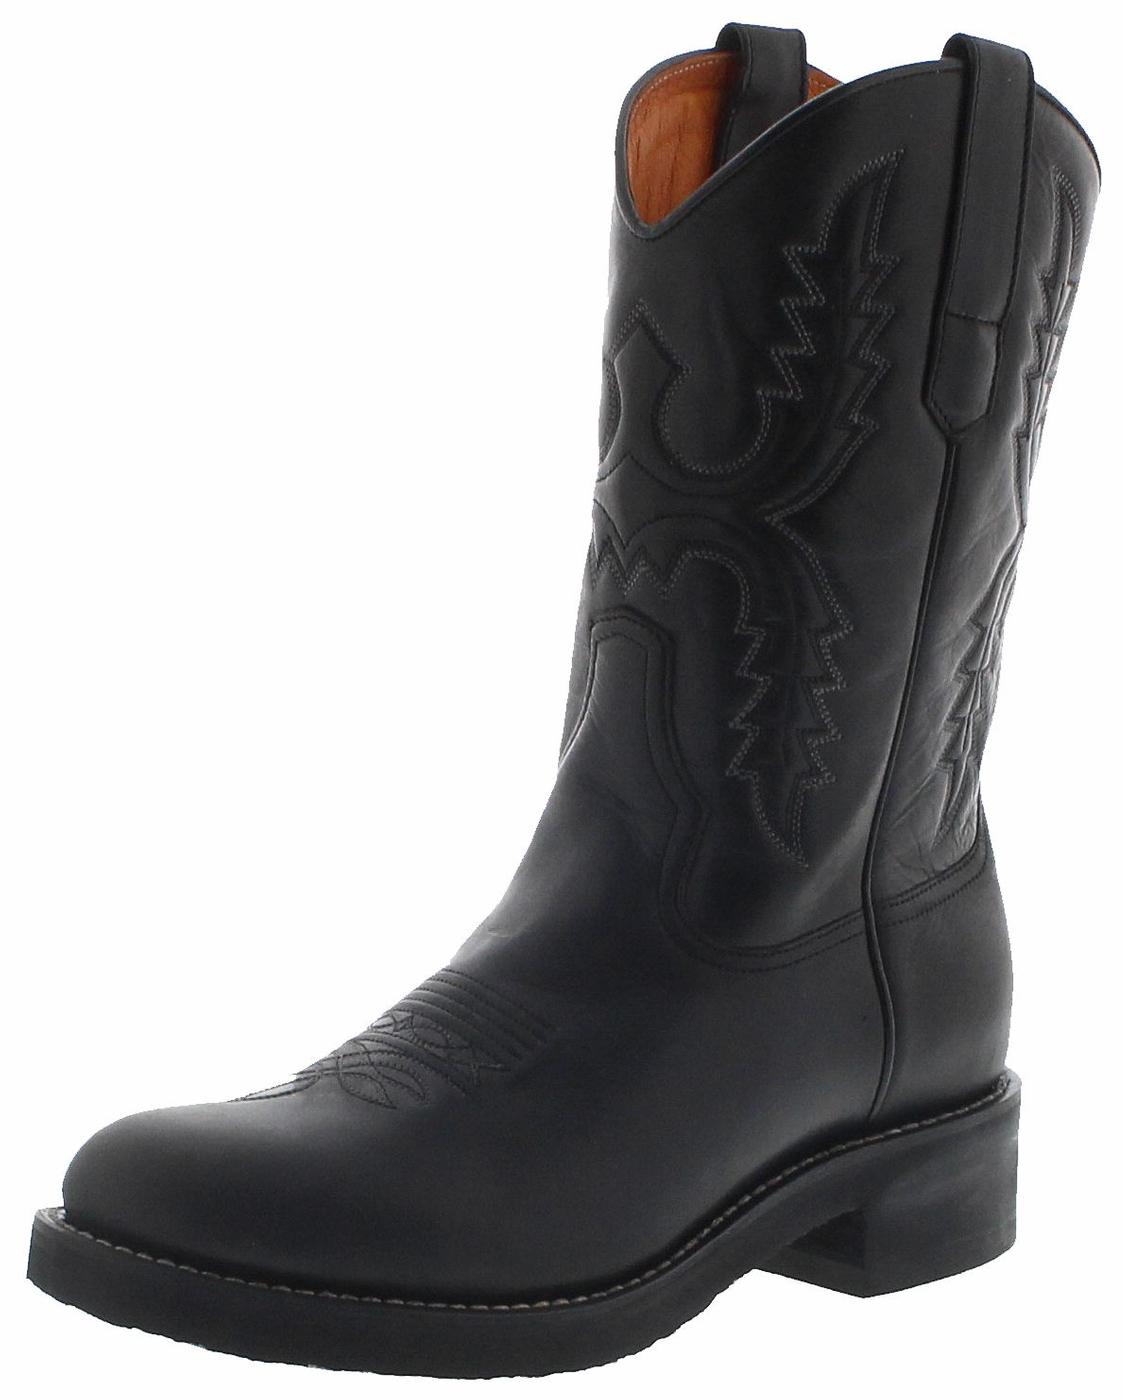 Sendra Boots 11615 Negro Mens Western Riding Boots - black